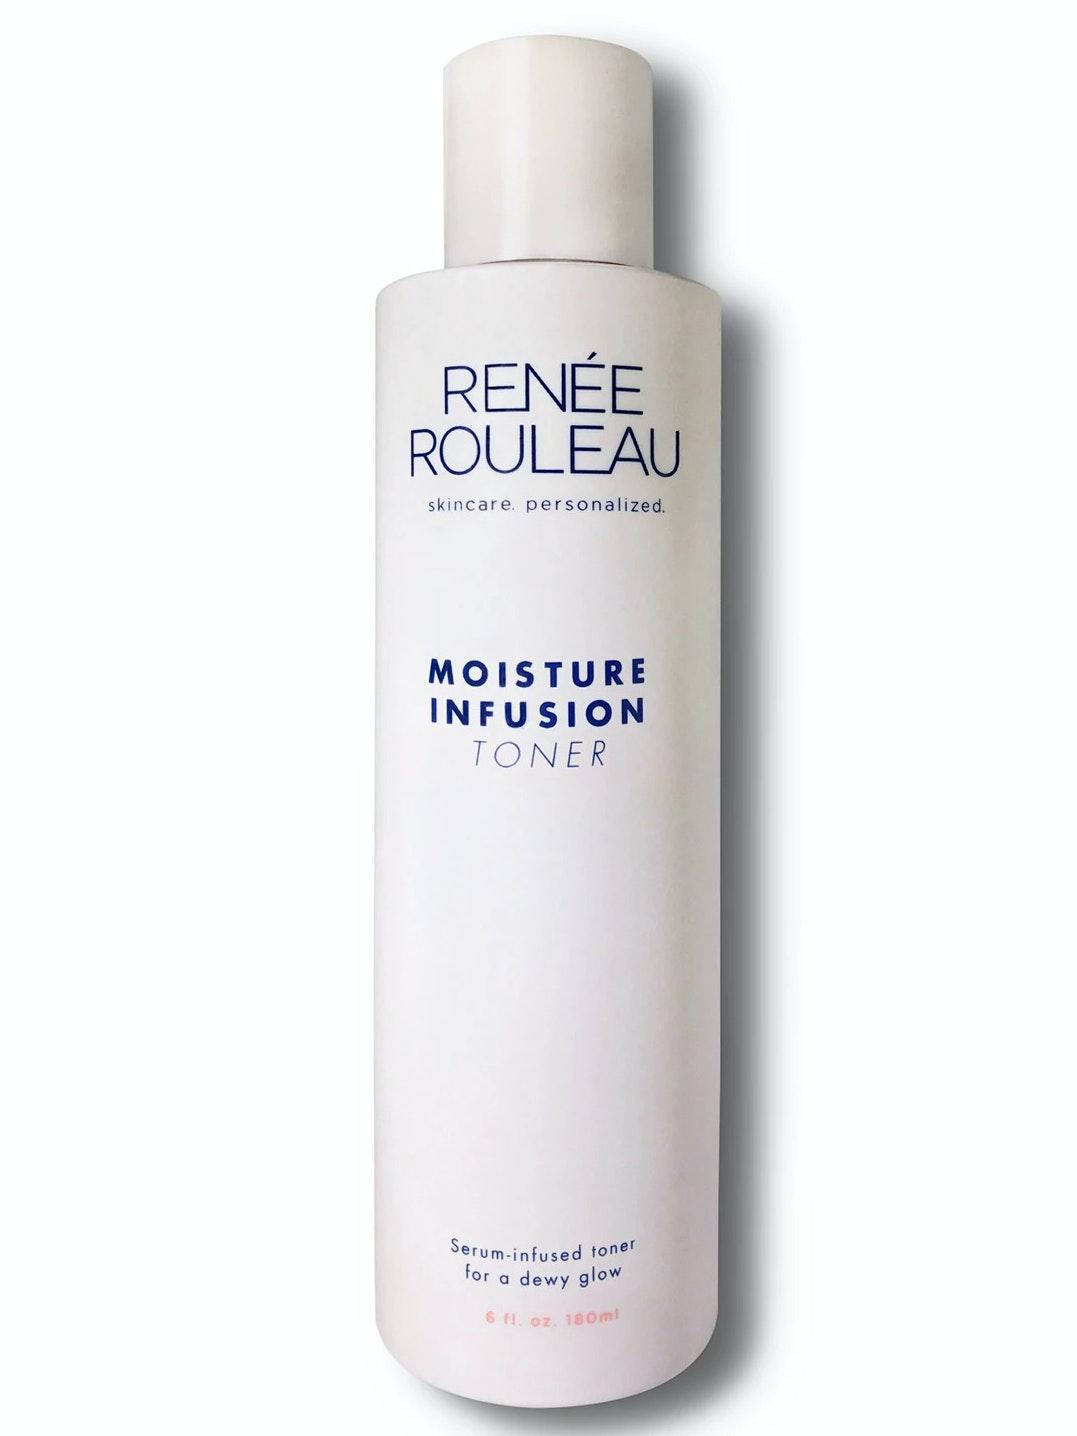 Renée Rouleau Moisture Infusion Toner